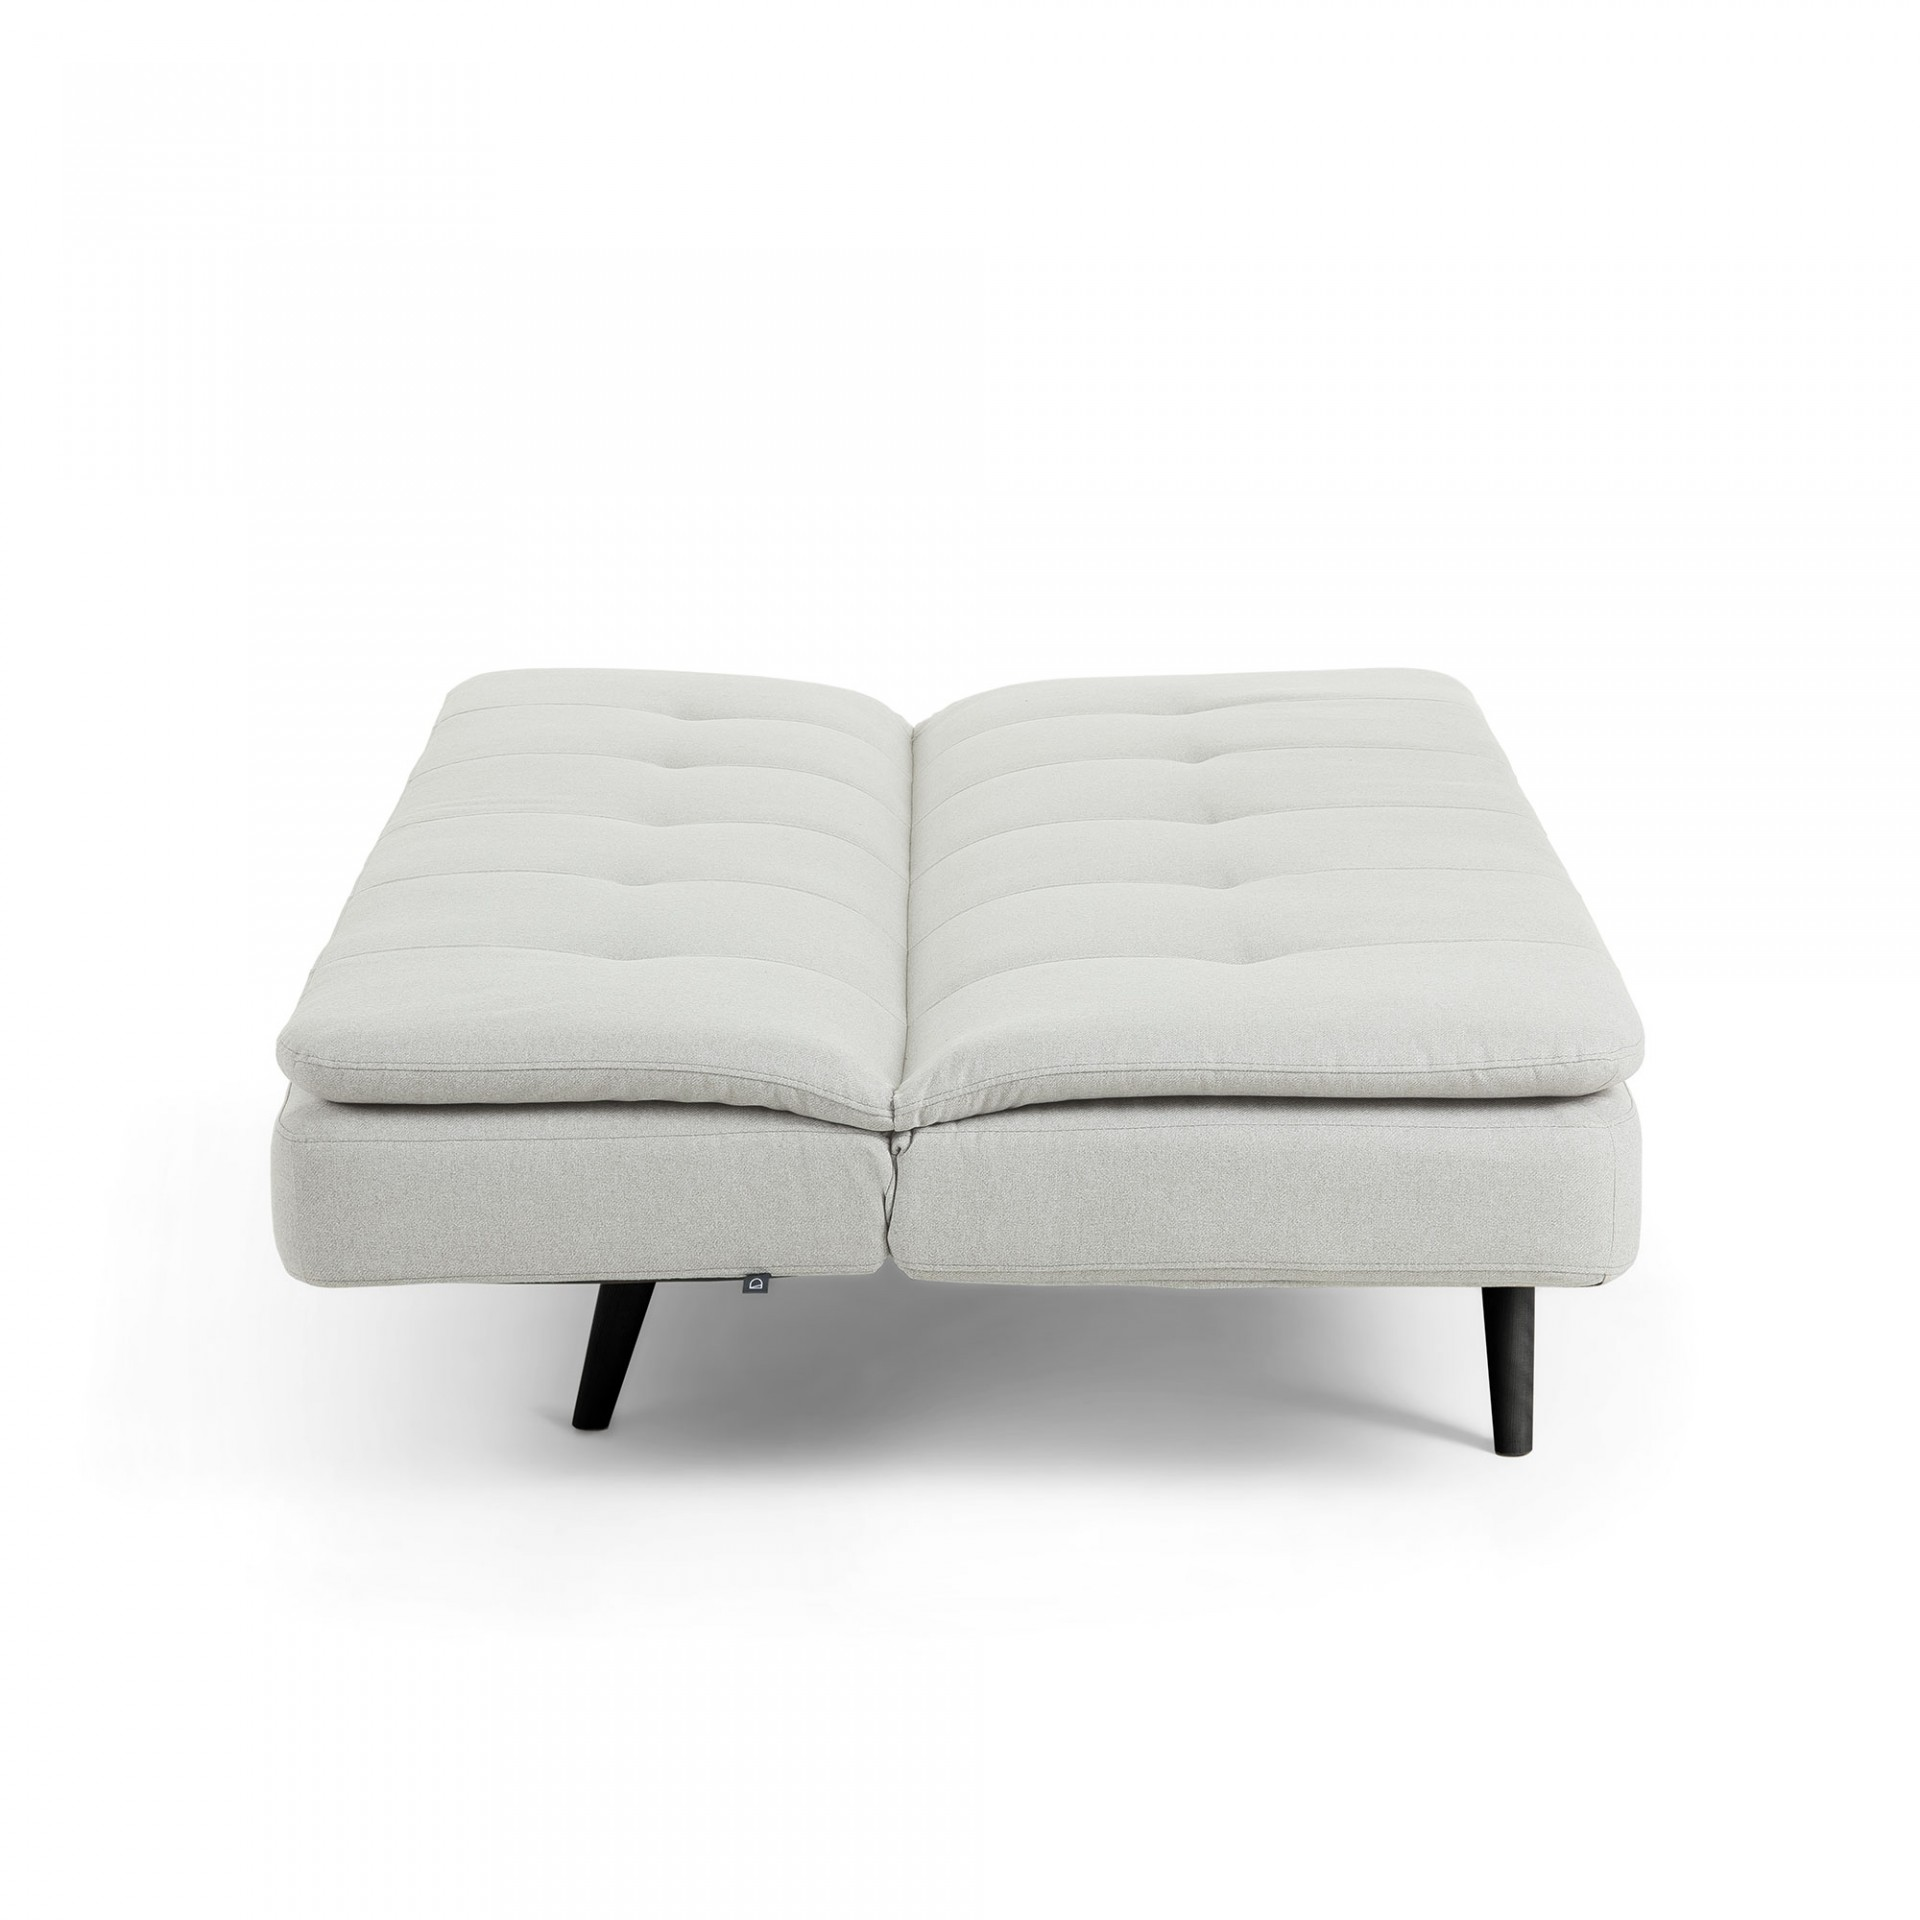 Sofá-cama Abig, estofado, 85x179 cm